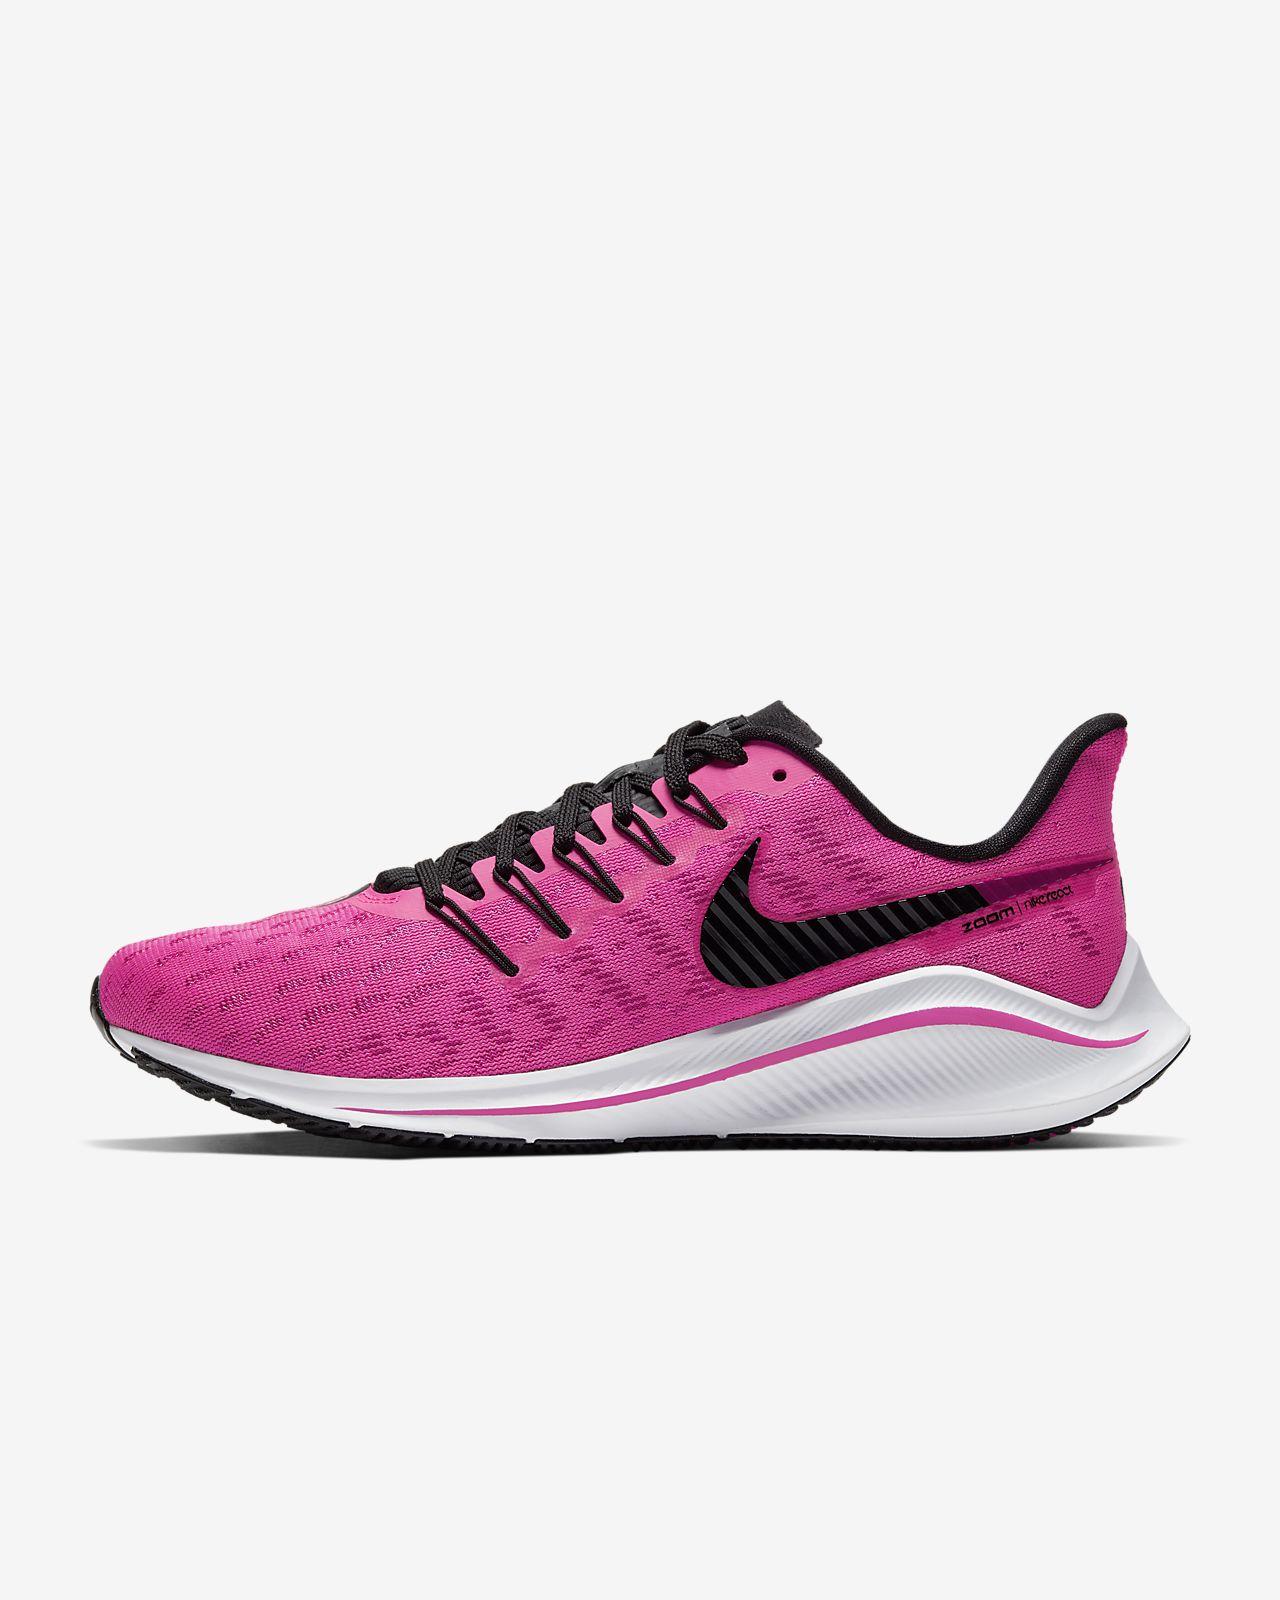 Sapatilhas de running Nike Air Zoom Vomero 14 para mulher